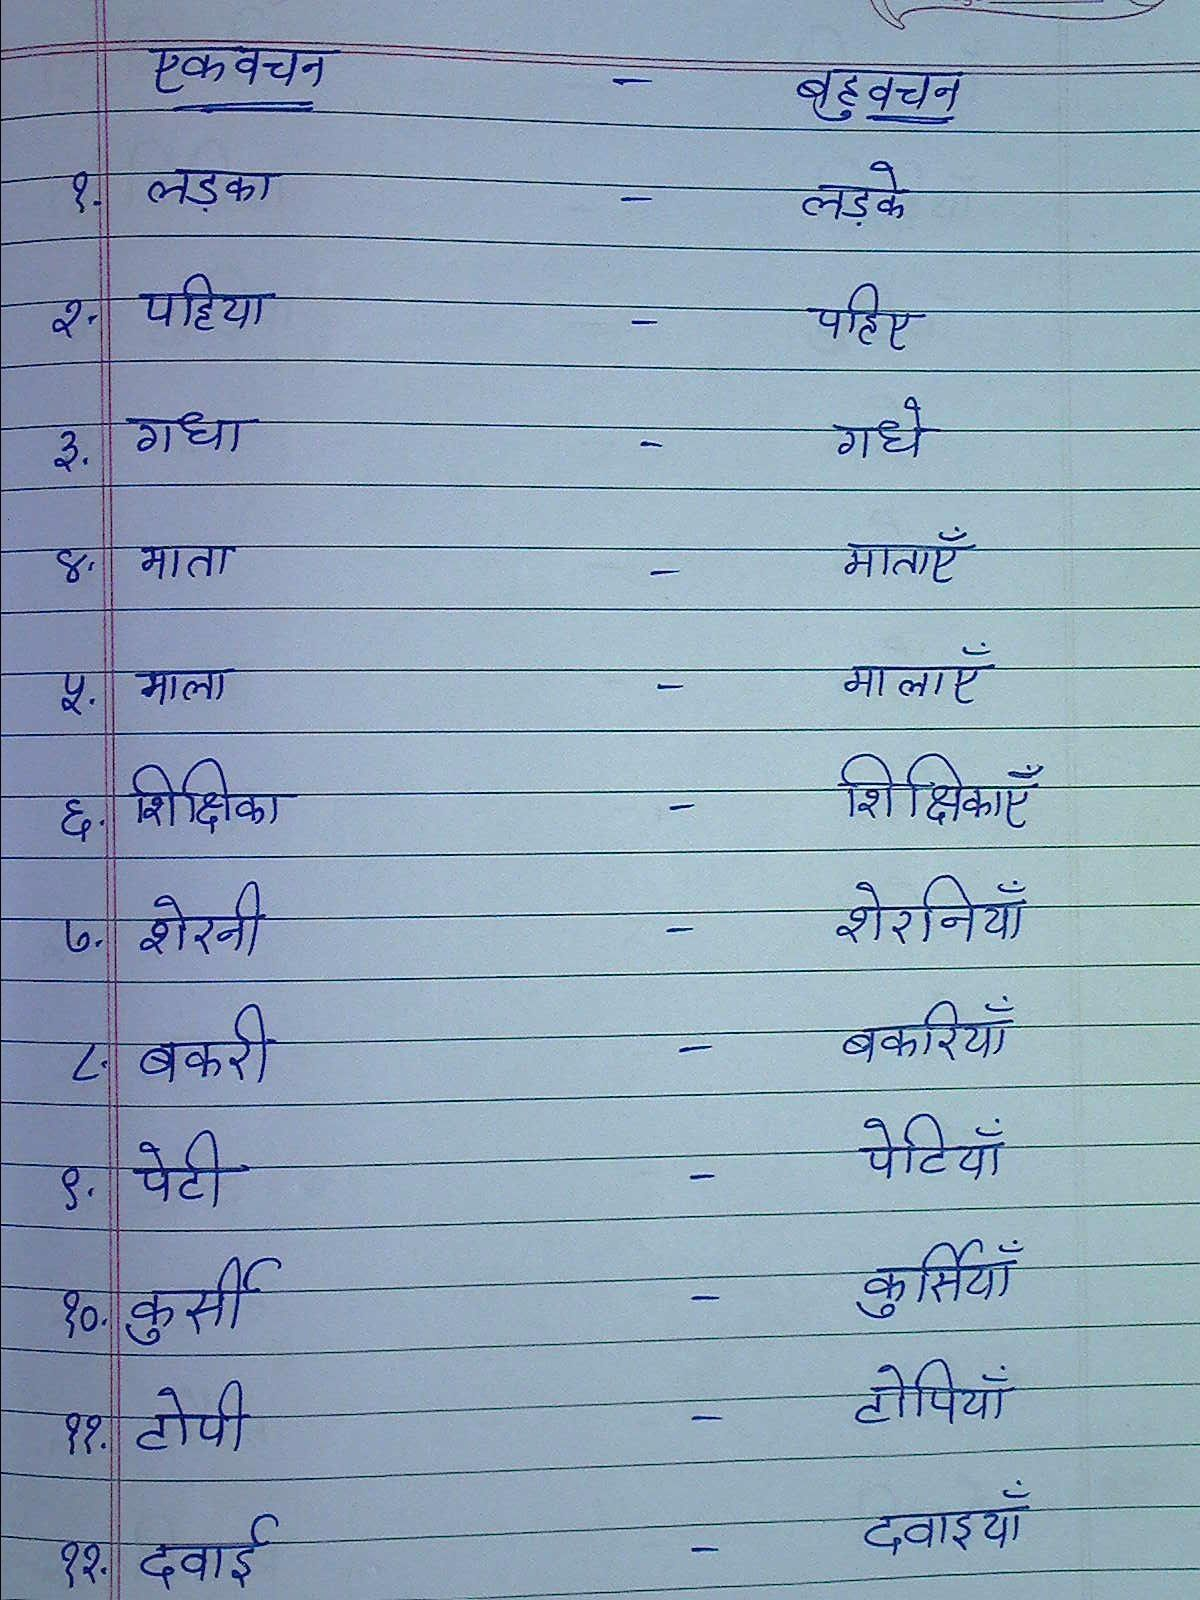 medium resolution of Numbers Worksheet In Hindi Fresh Hindi Grammar Kriya Worksheets For Class 2  numbers worksheet in hind…   Worksheet for class 2